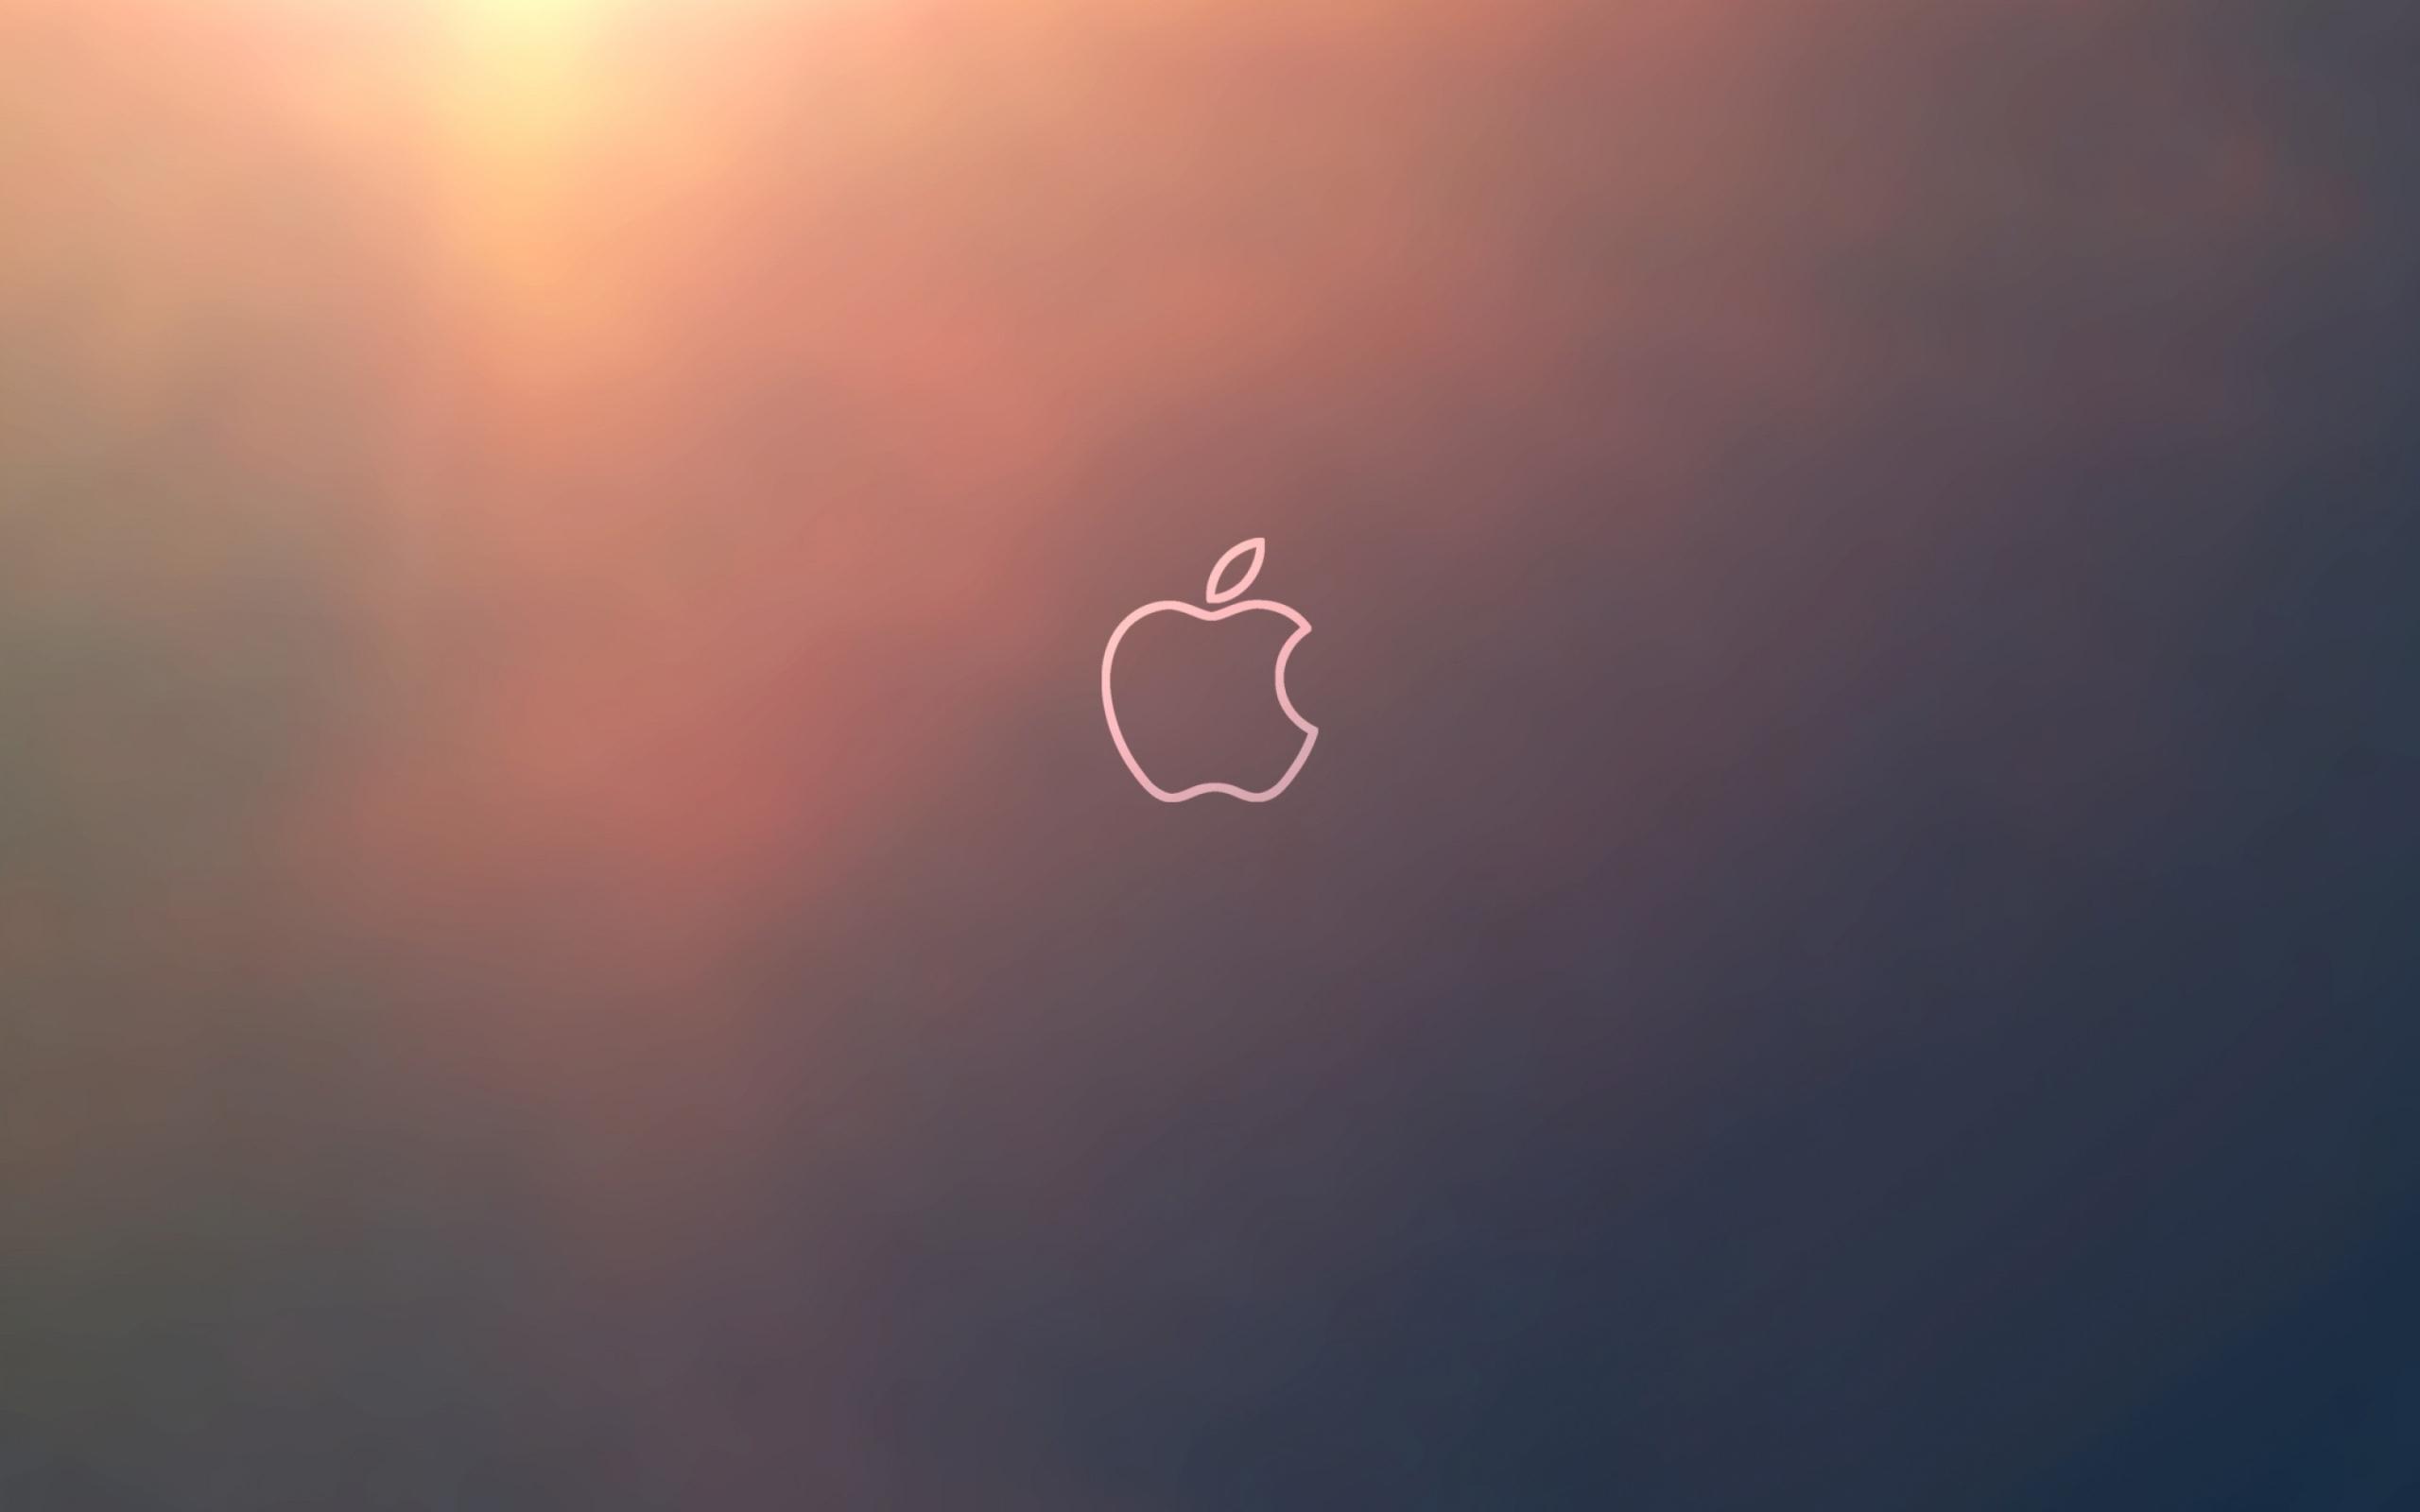 macbook pro retina apple wallpaper wallpaper details 2560x1600